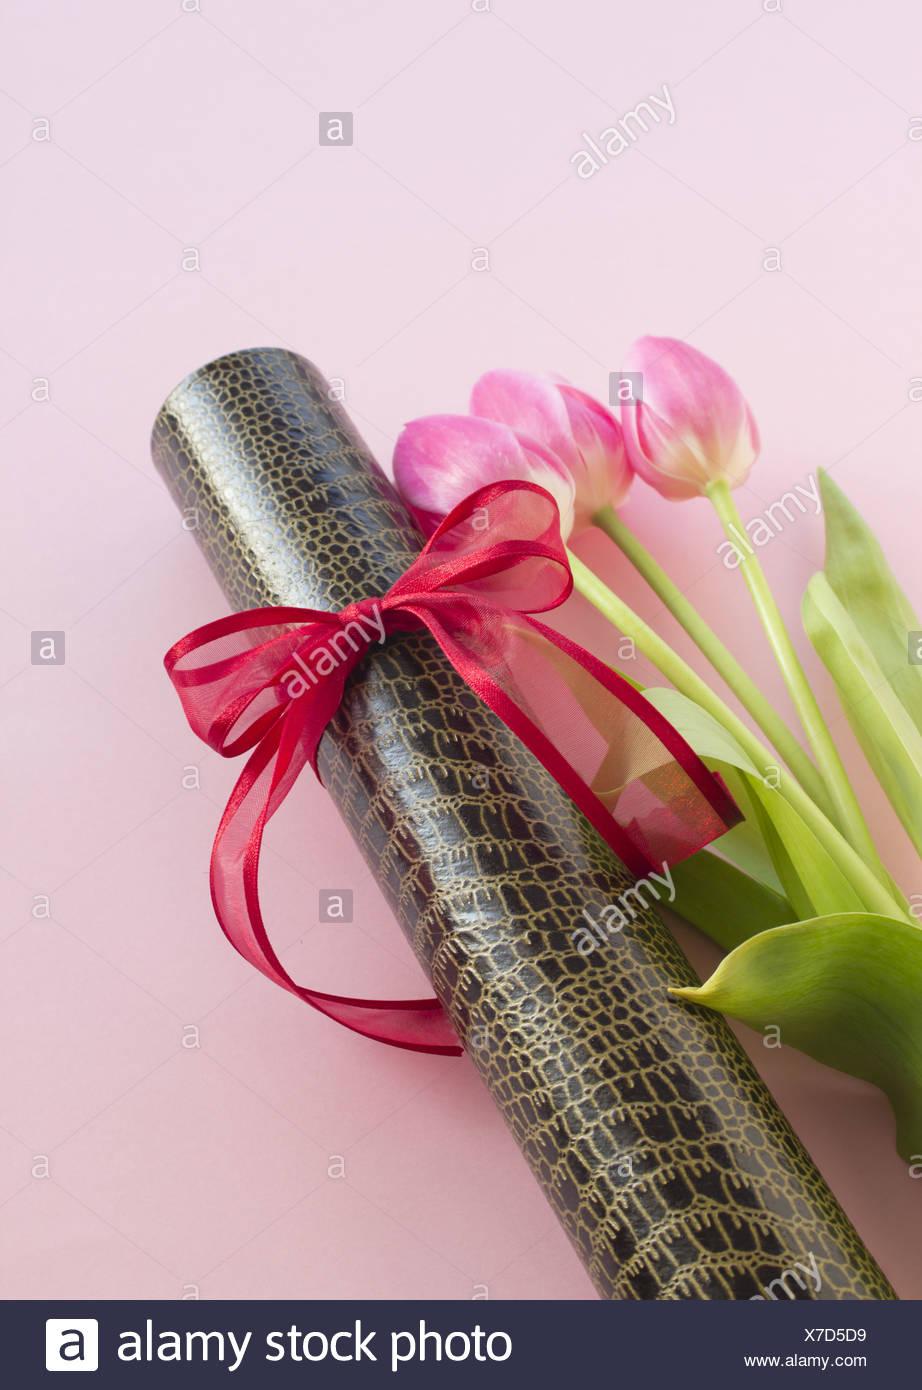 Diploma tube and tulips - Stock Image